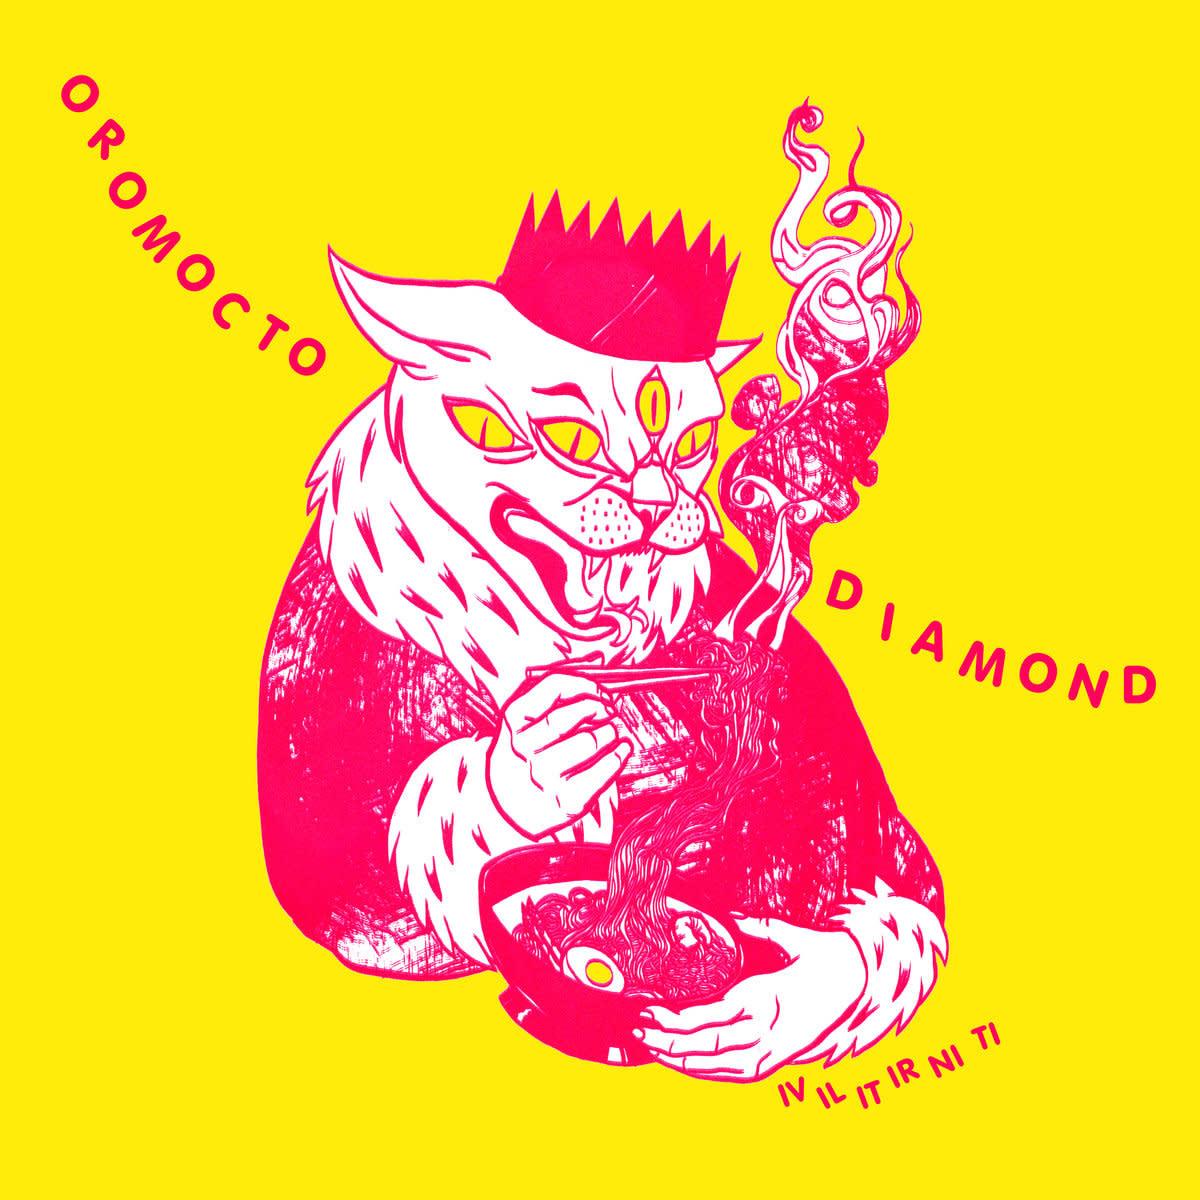 Oromocto Diamond • IV IL IT IR NI TI-1